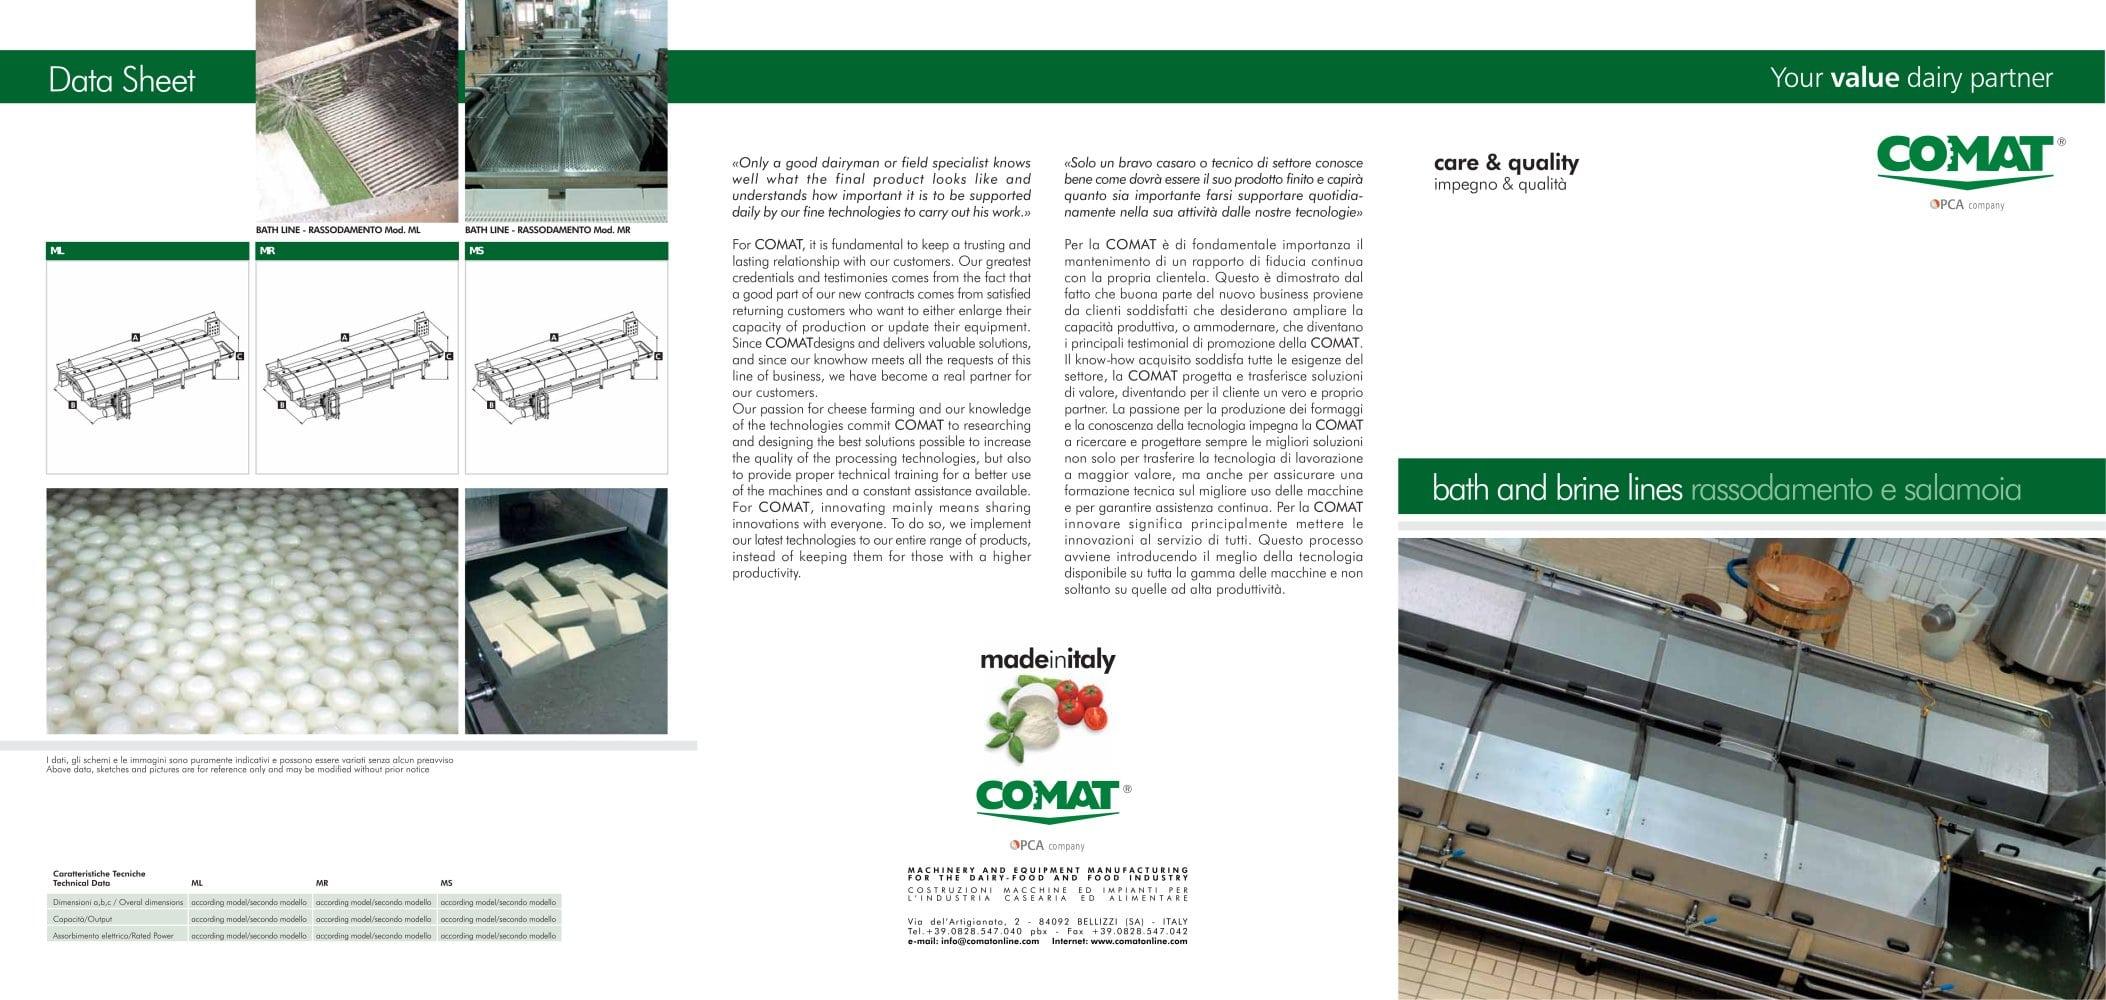 Schemi Elettrici Pdf : Mr hardening line comat pdf catalogs technical